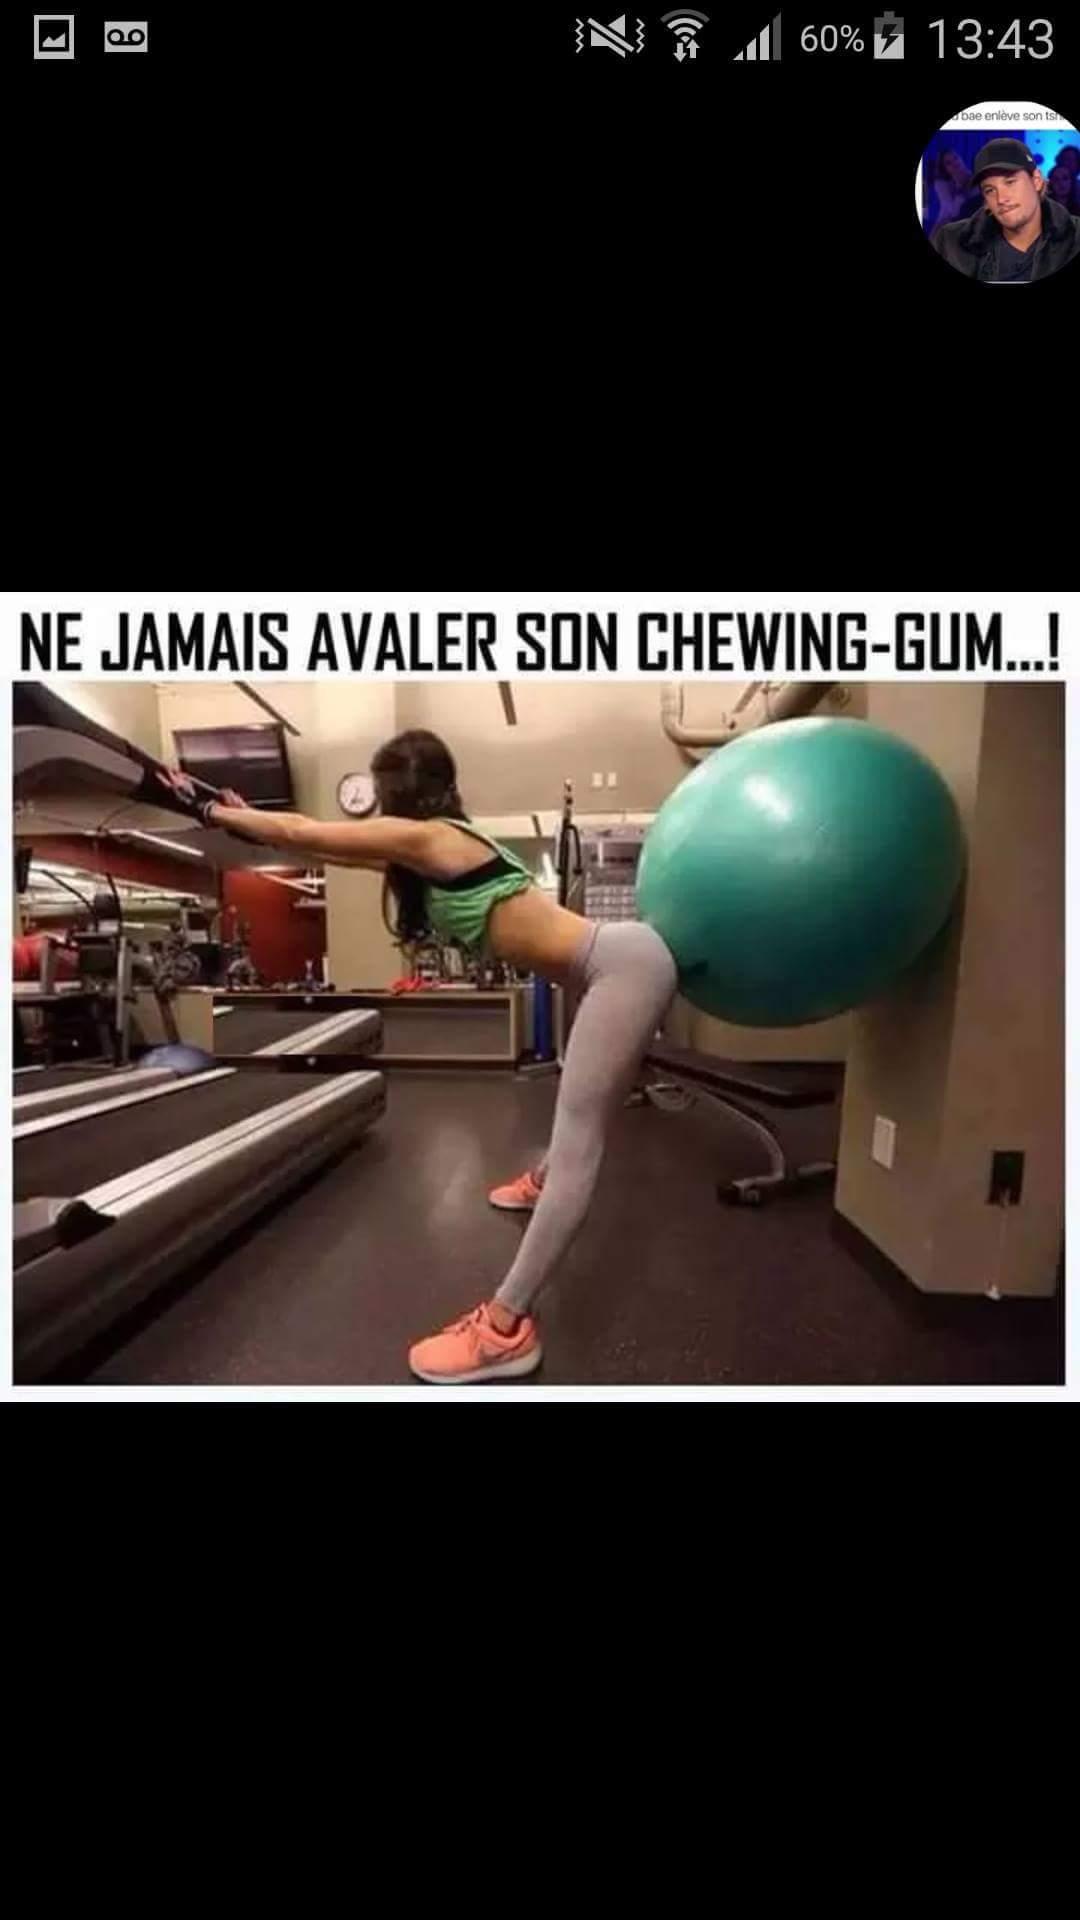 Toujours jeter son chewin-gum - meme